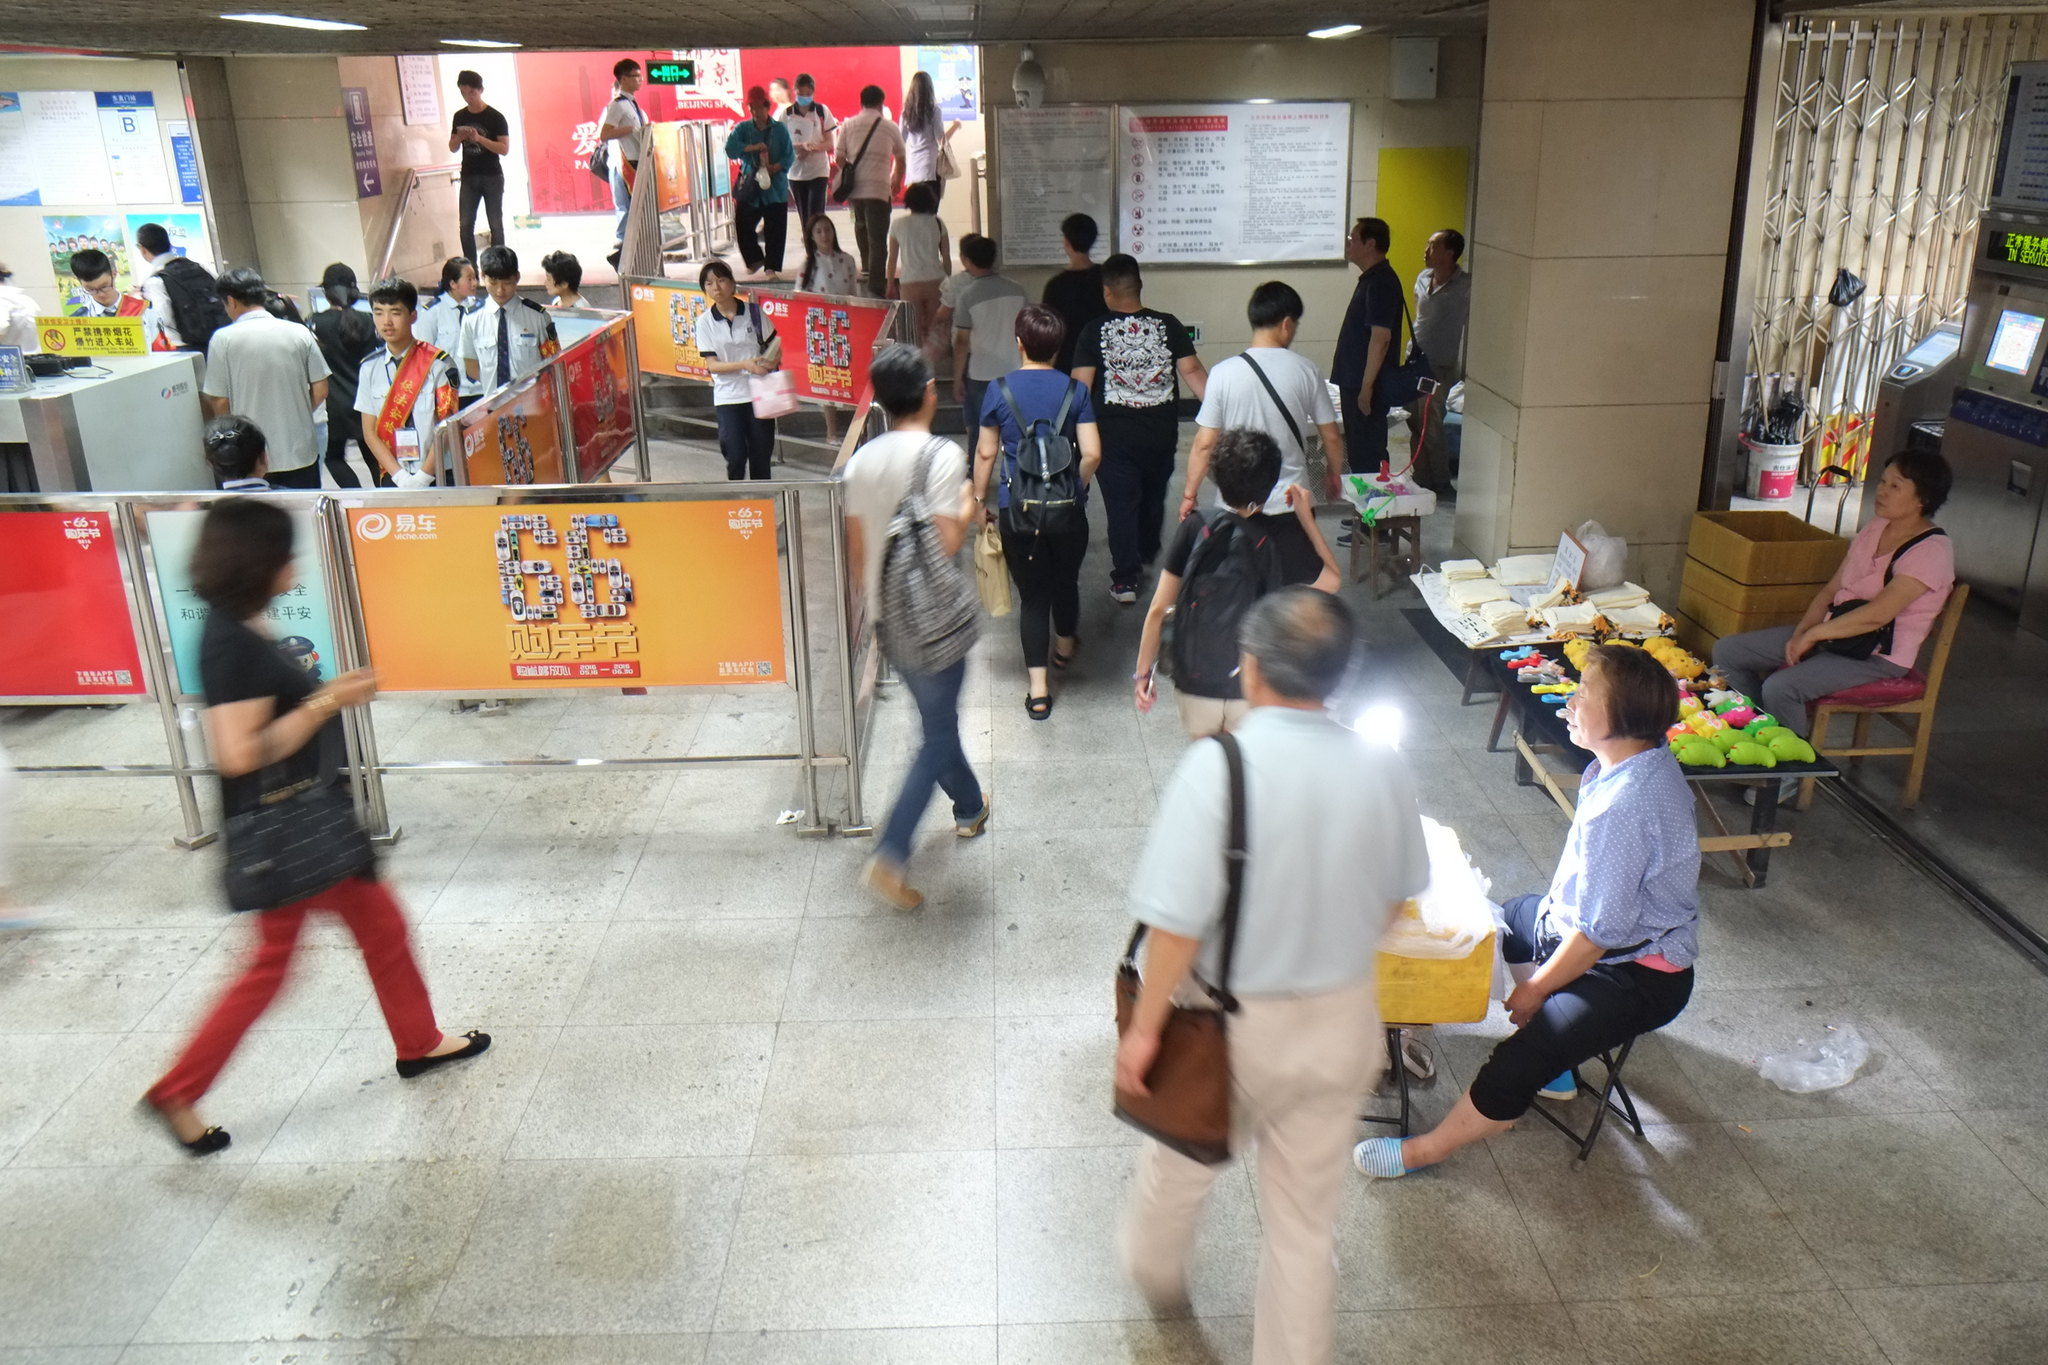 U-Bahn-Shops